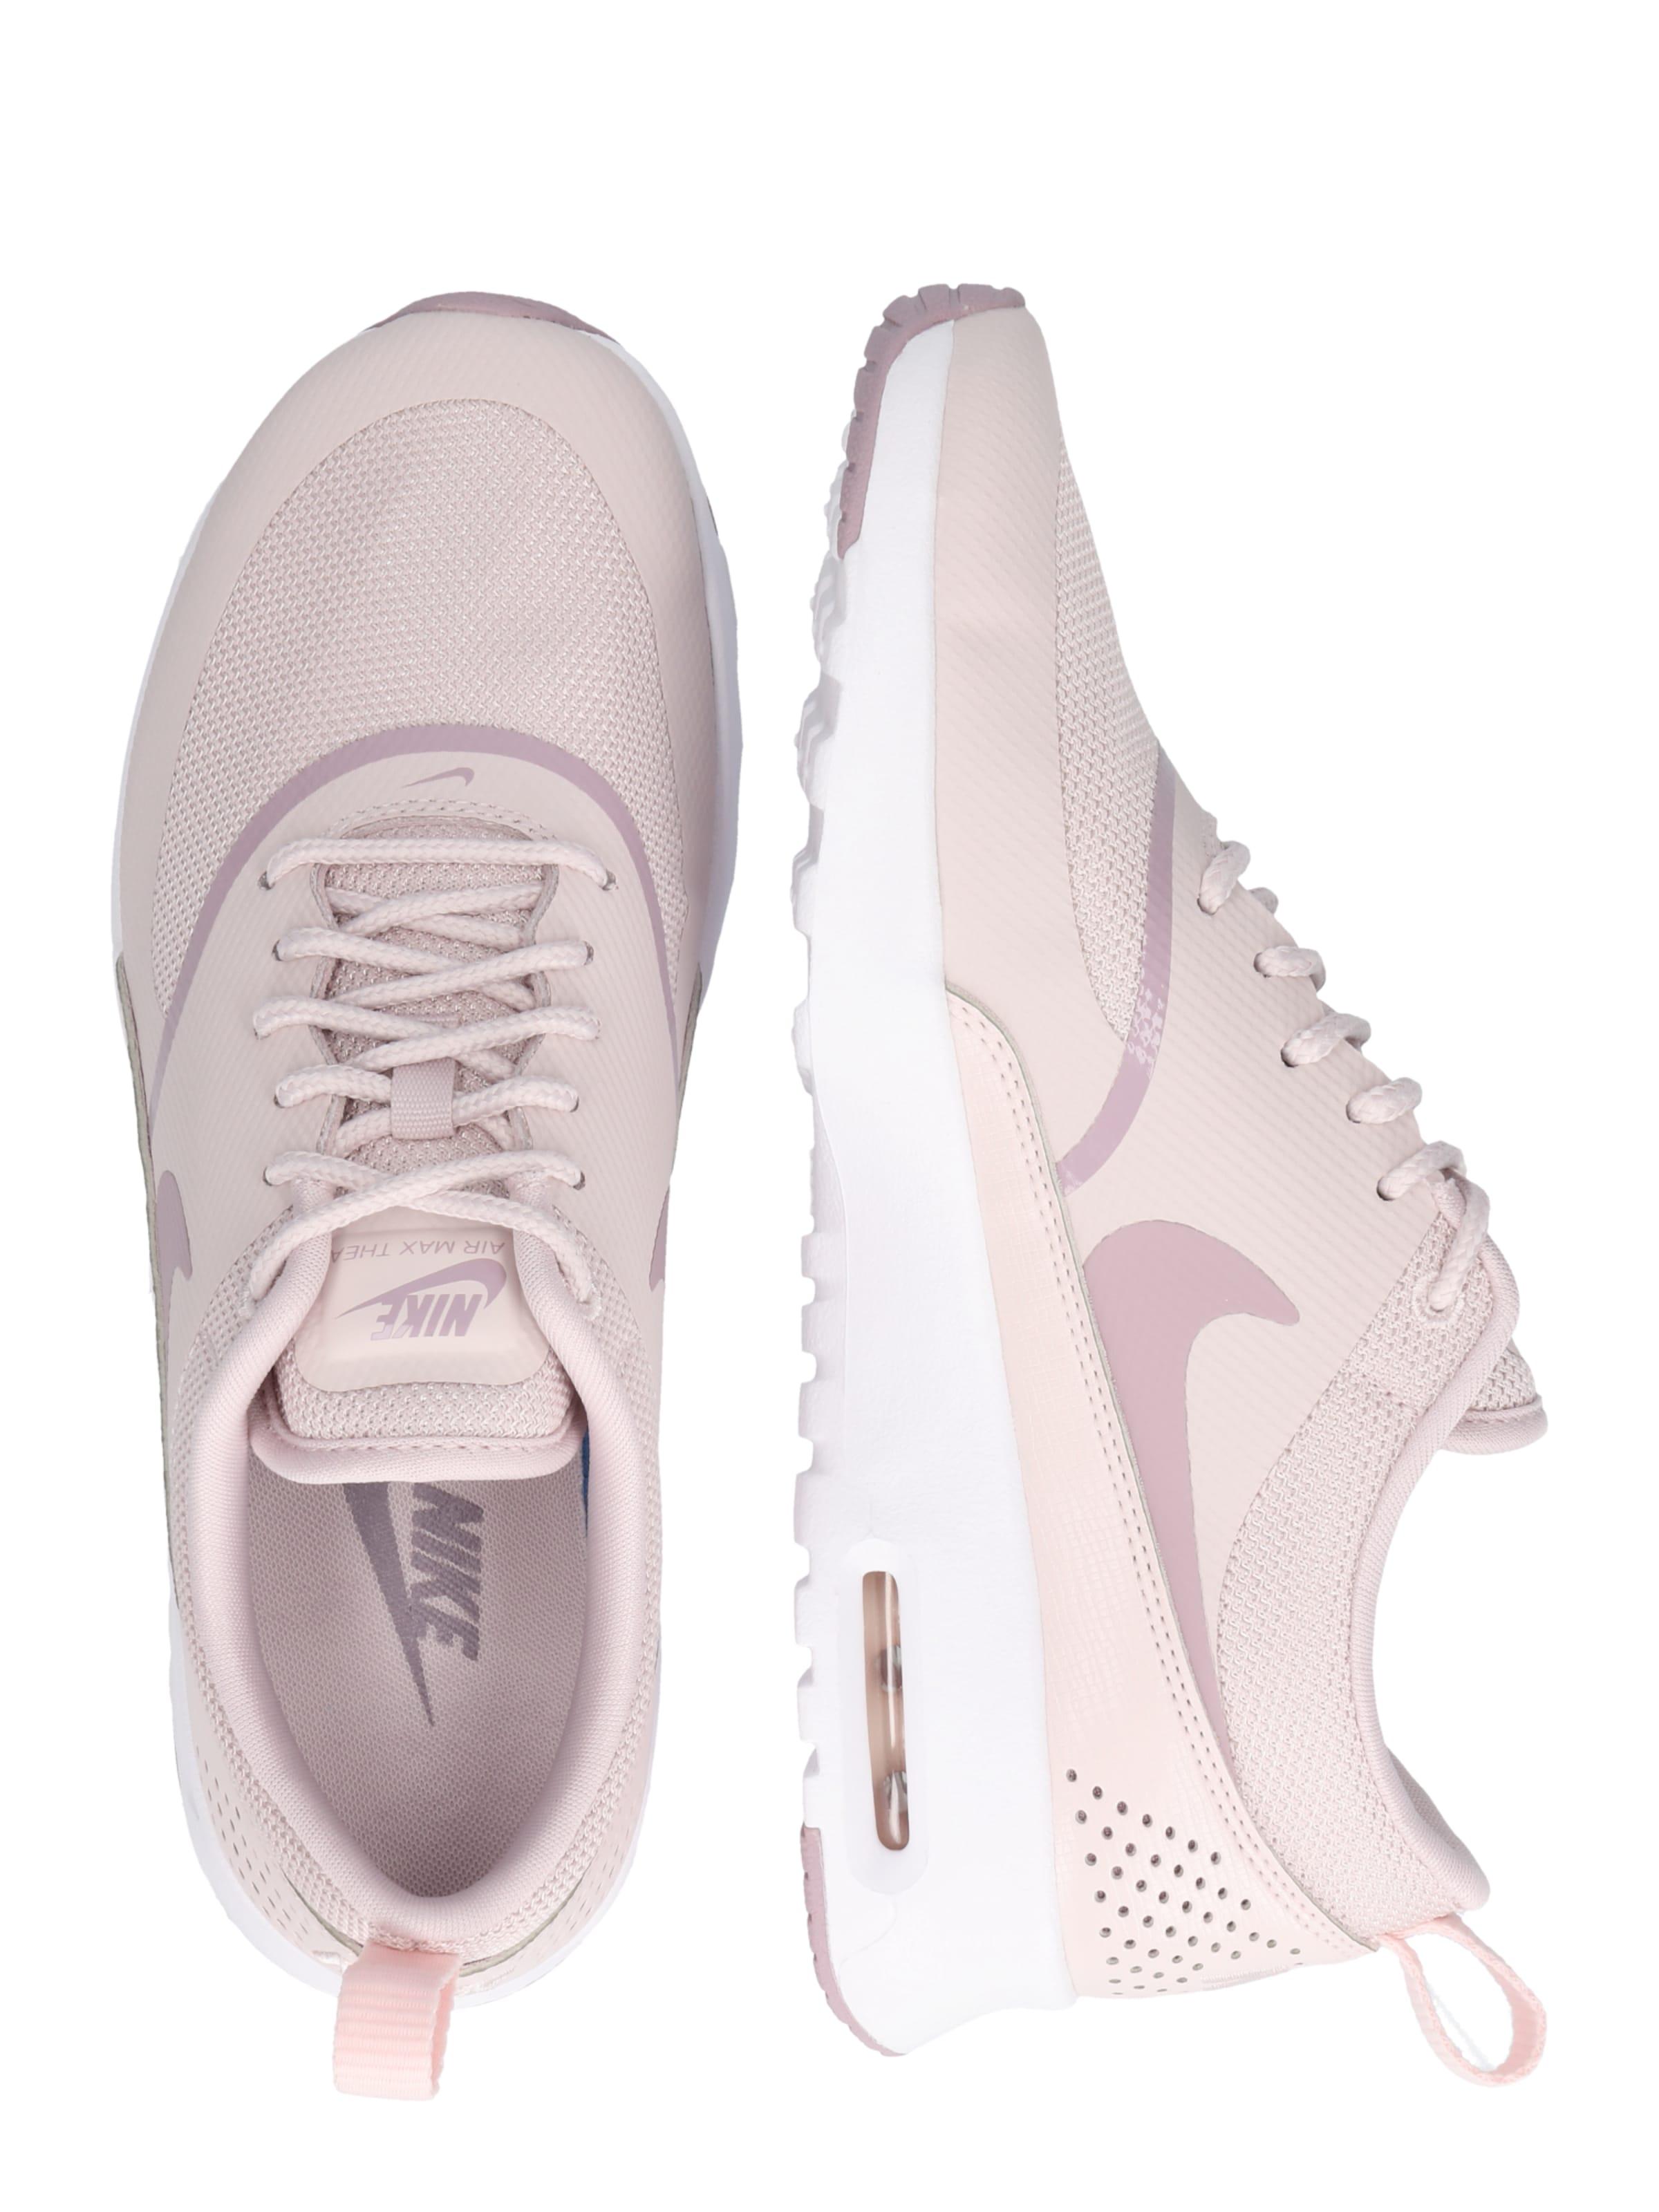 Nike Sportswear Turnschuhe Turnschuhe Turnschuhe Low 'AIR MAX THEA Synthetik, Textil Verkaufen Sie saisonale Aktionen f0e052